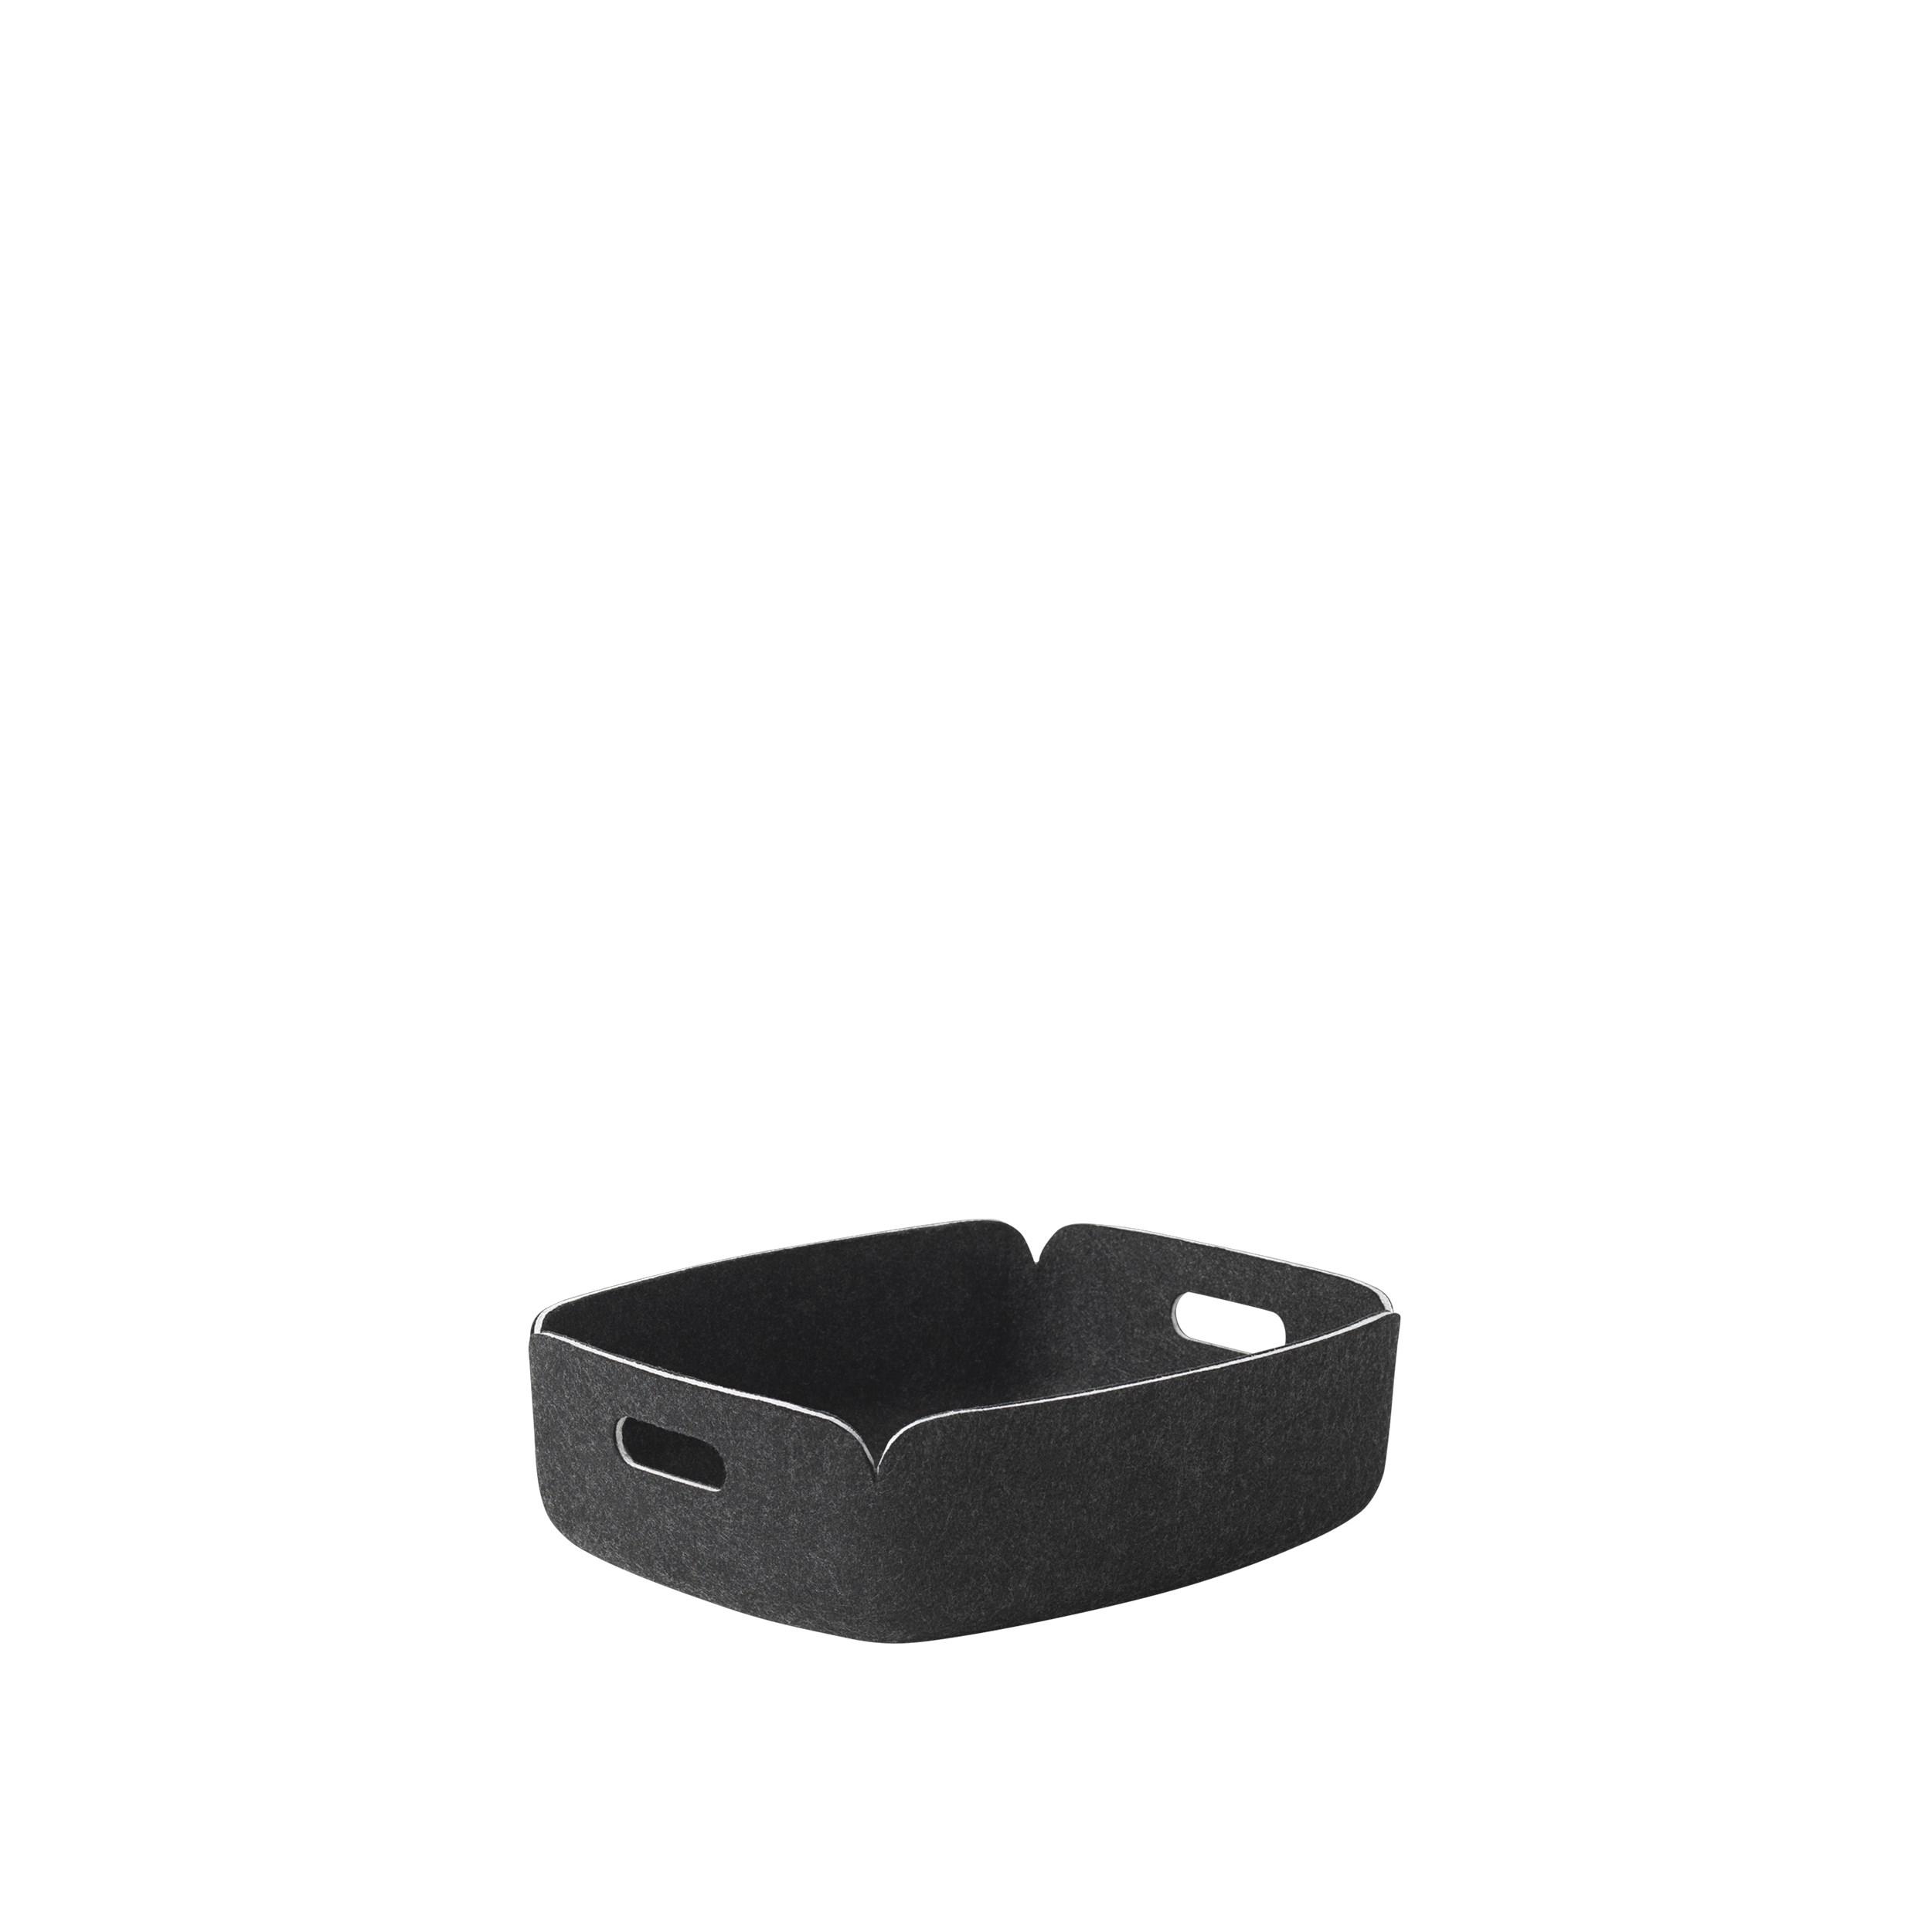 Restore tray black melange